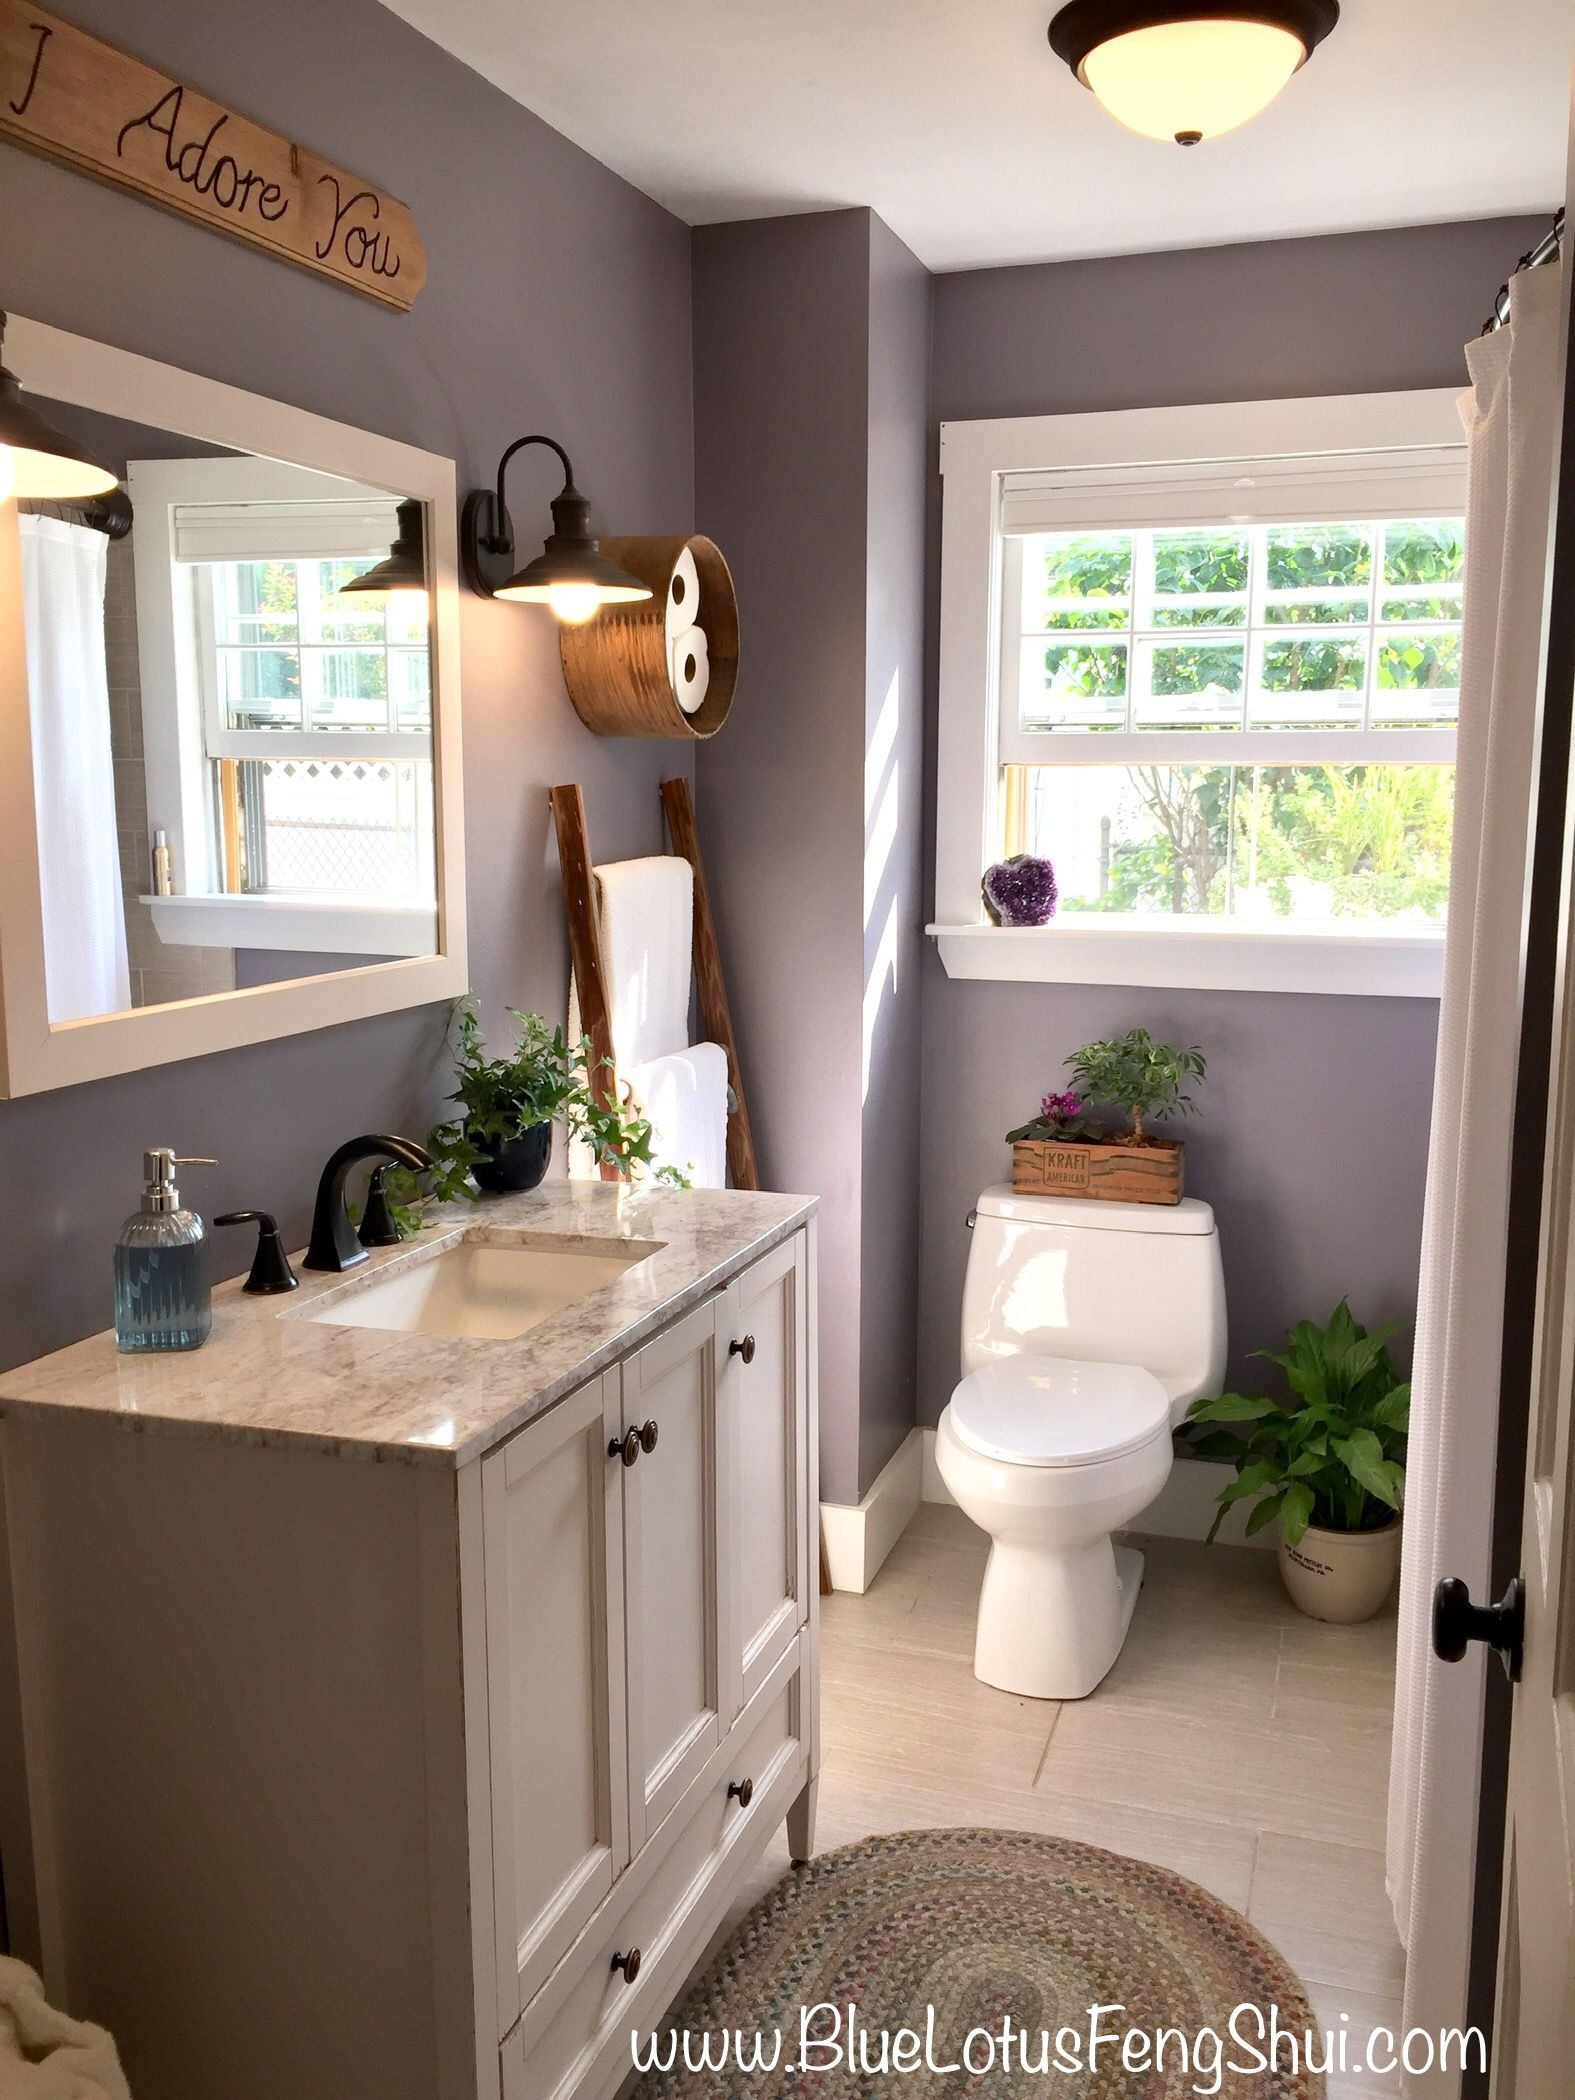 Stunning Farmhouse Rustic Bathroom With Sherwin Williams Gris